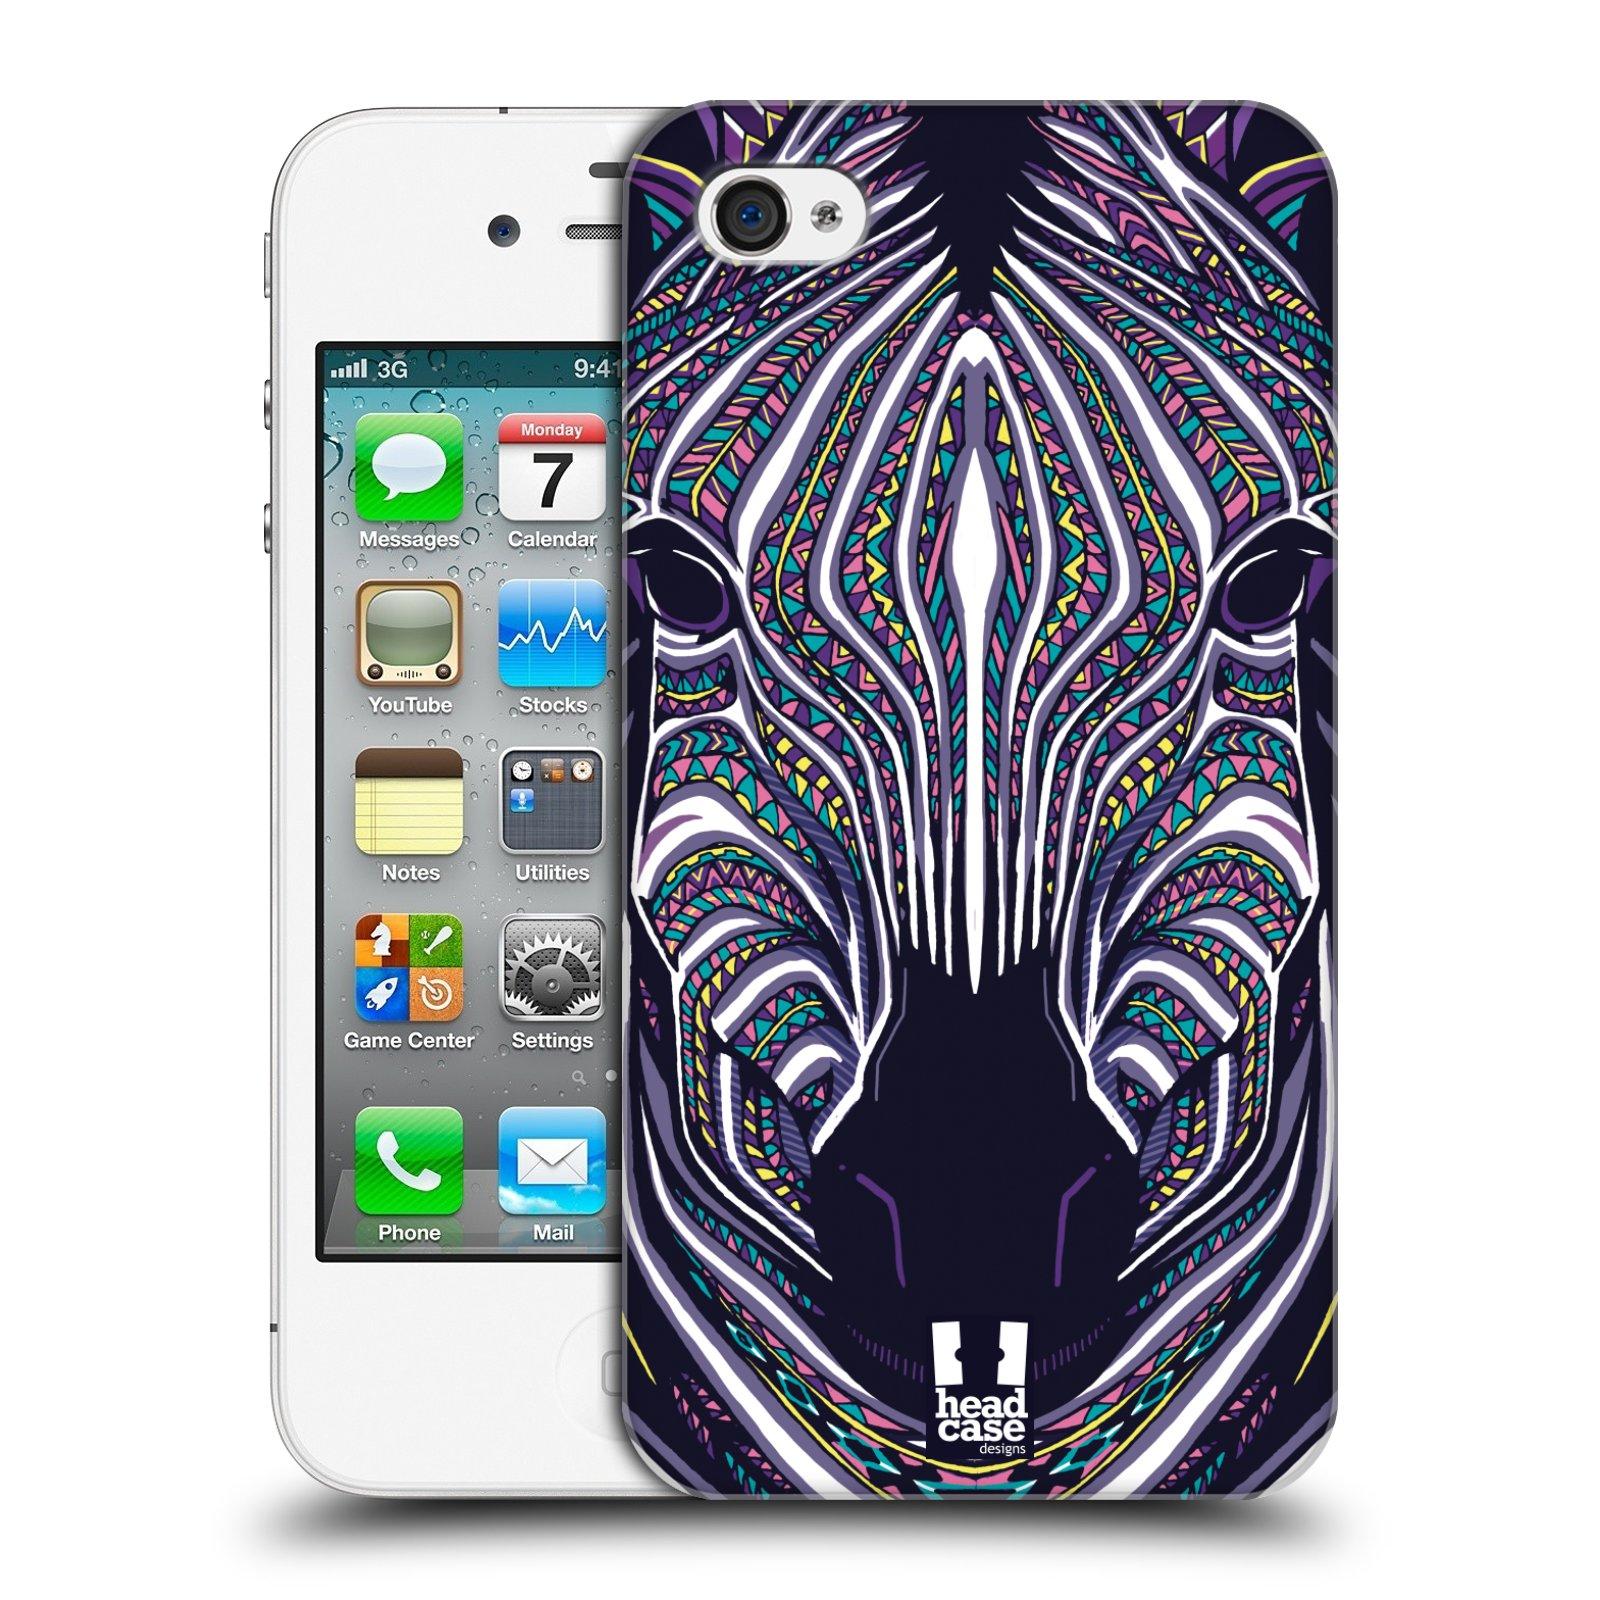 Plastové pouzdro na mobil Apple iPhone 4 a 4S HEAD CASE AZTEC ZEBRA